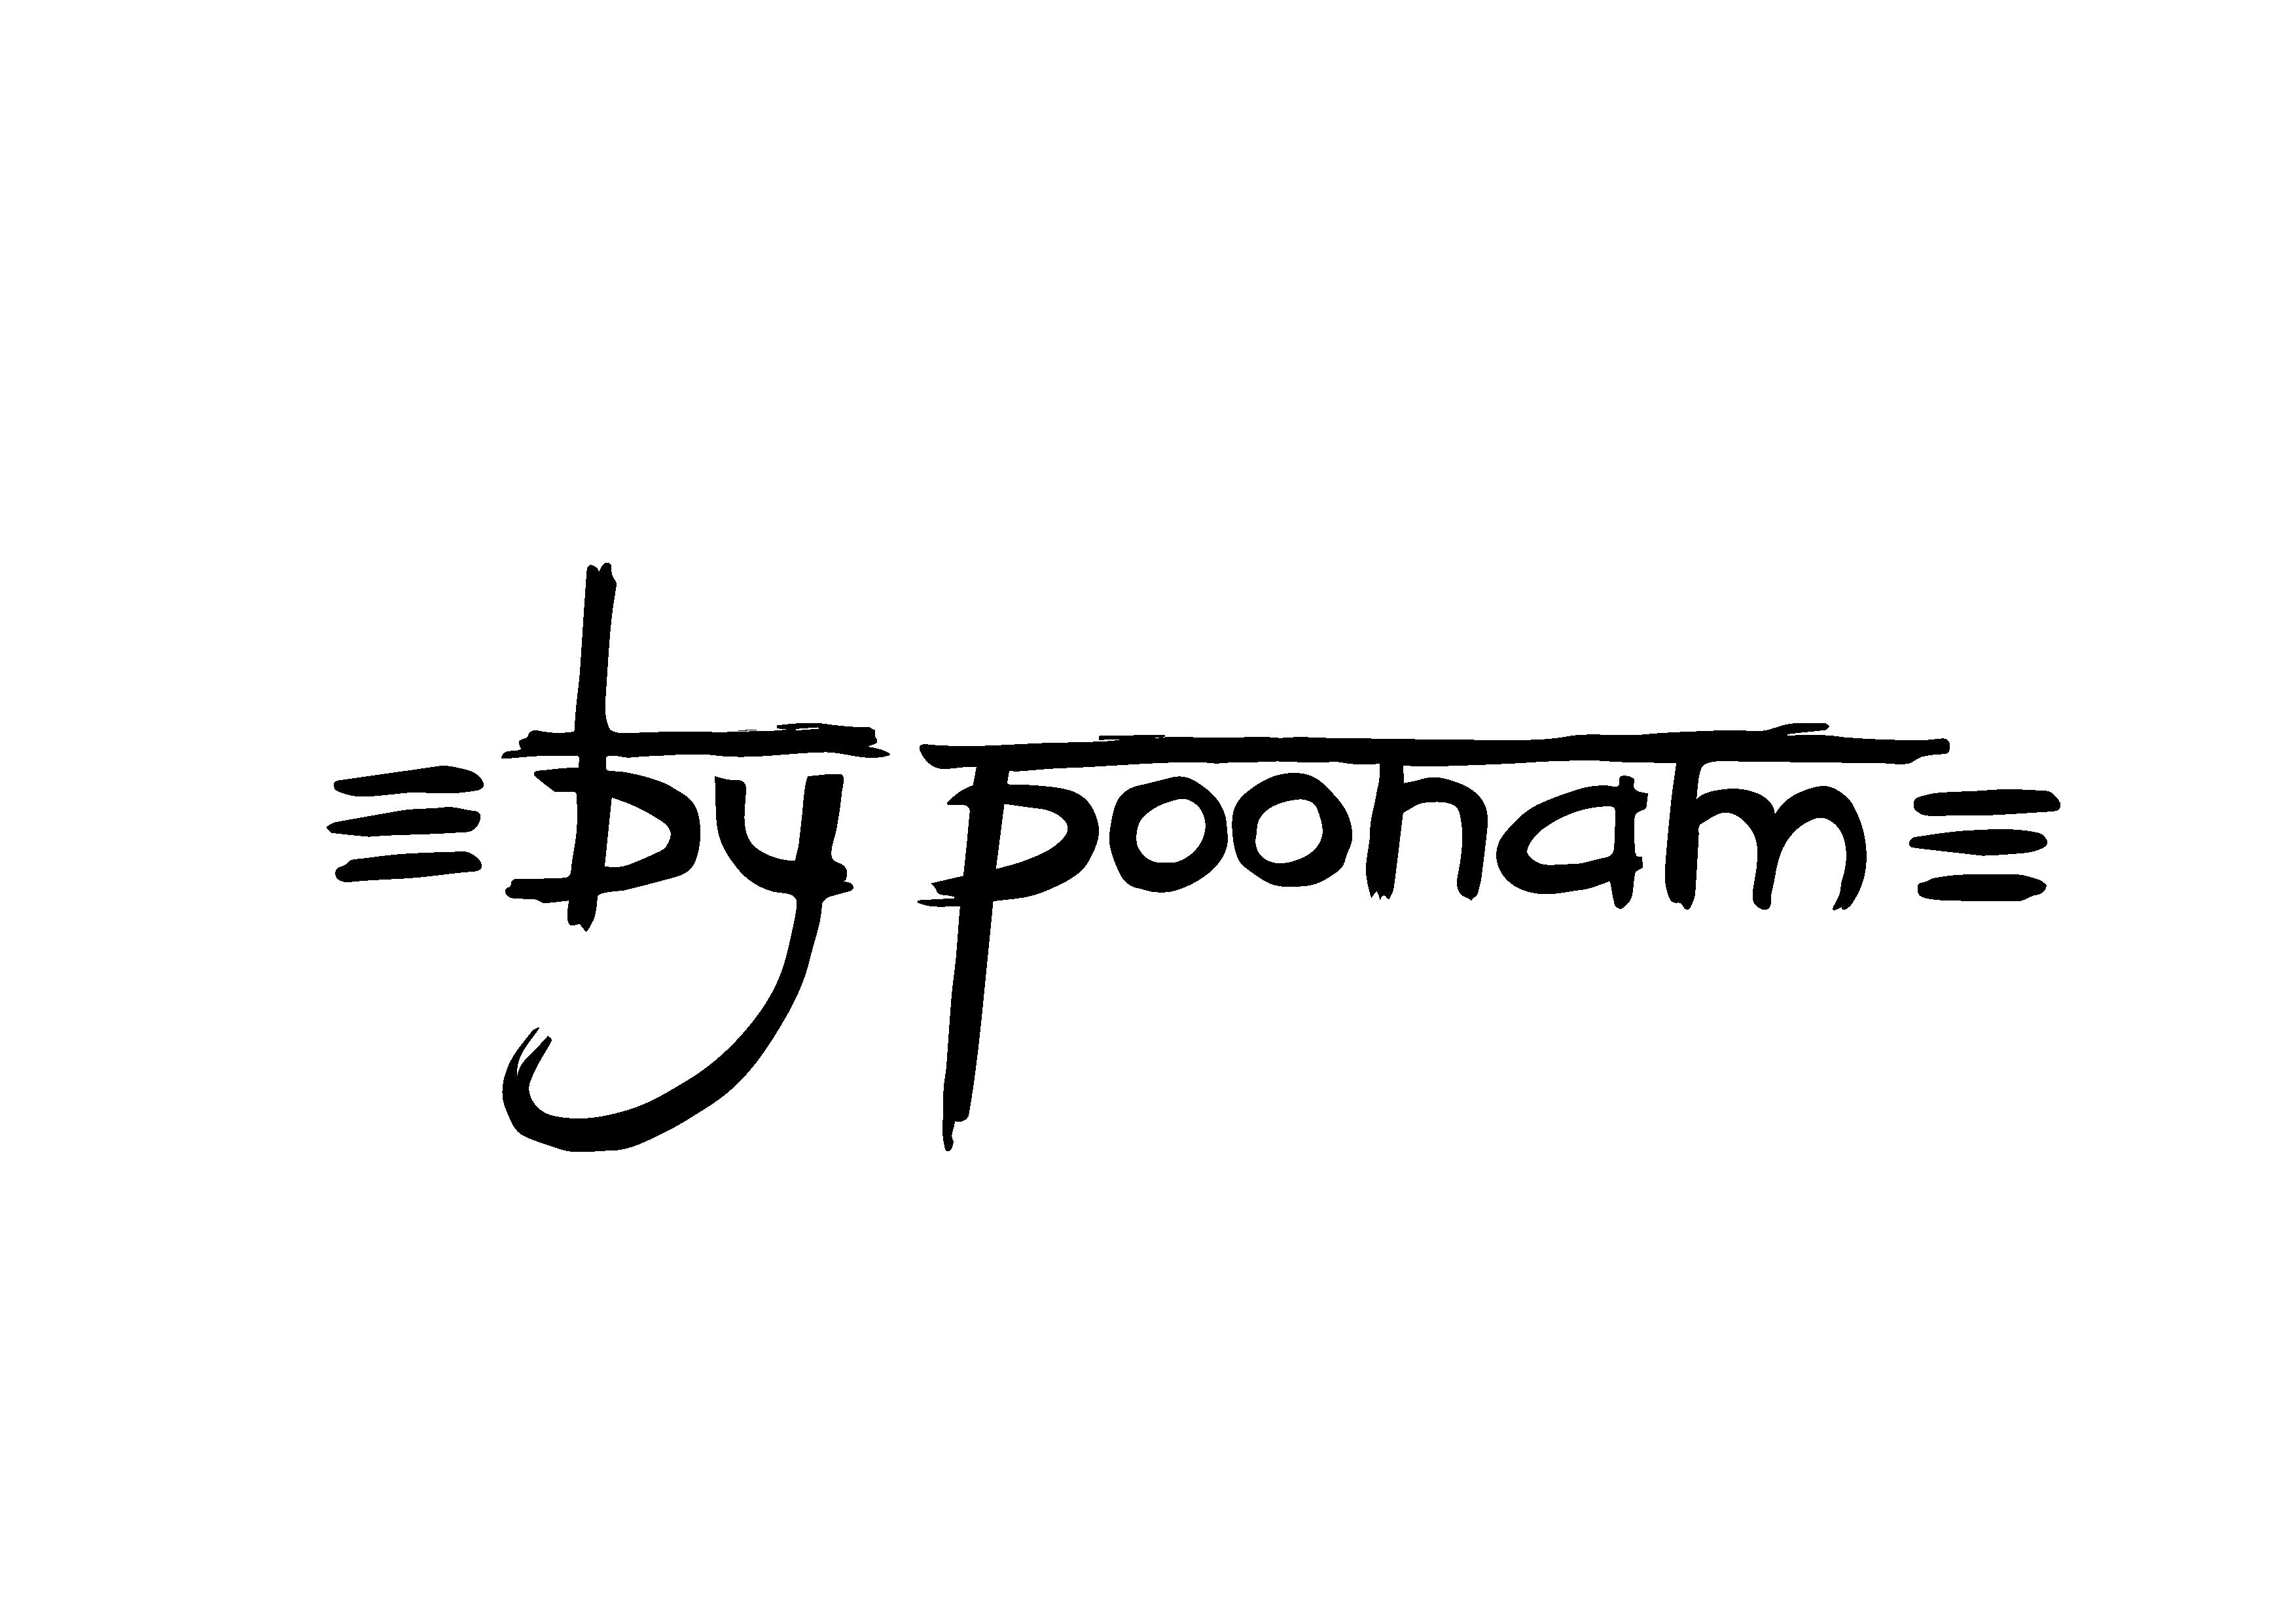 bypoonam logo black